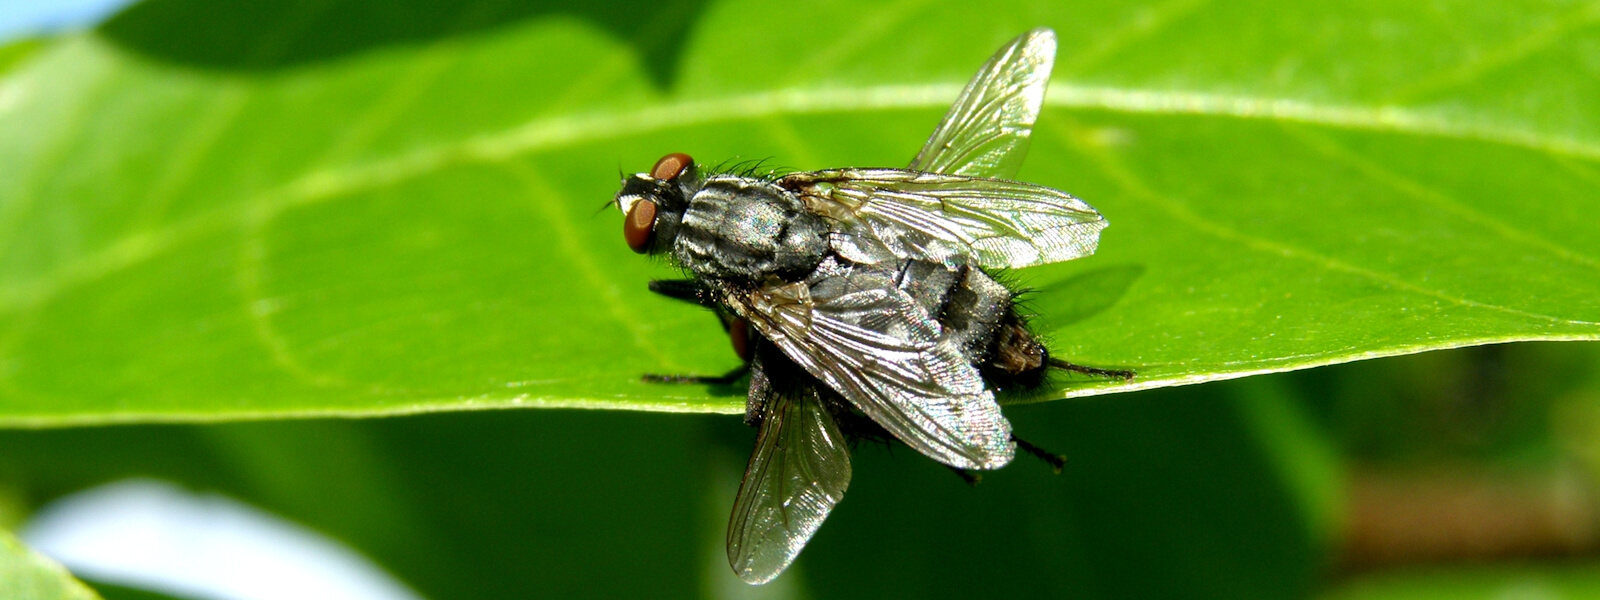 Fly landing on a green leaf